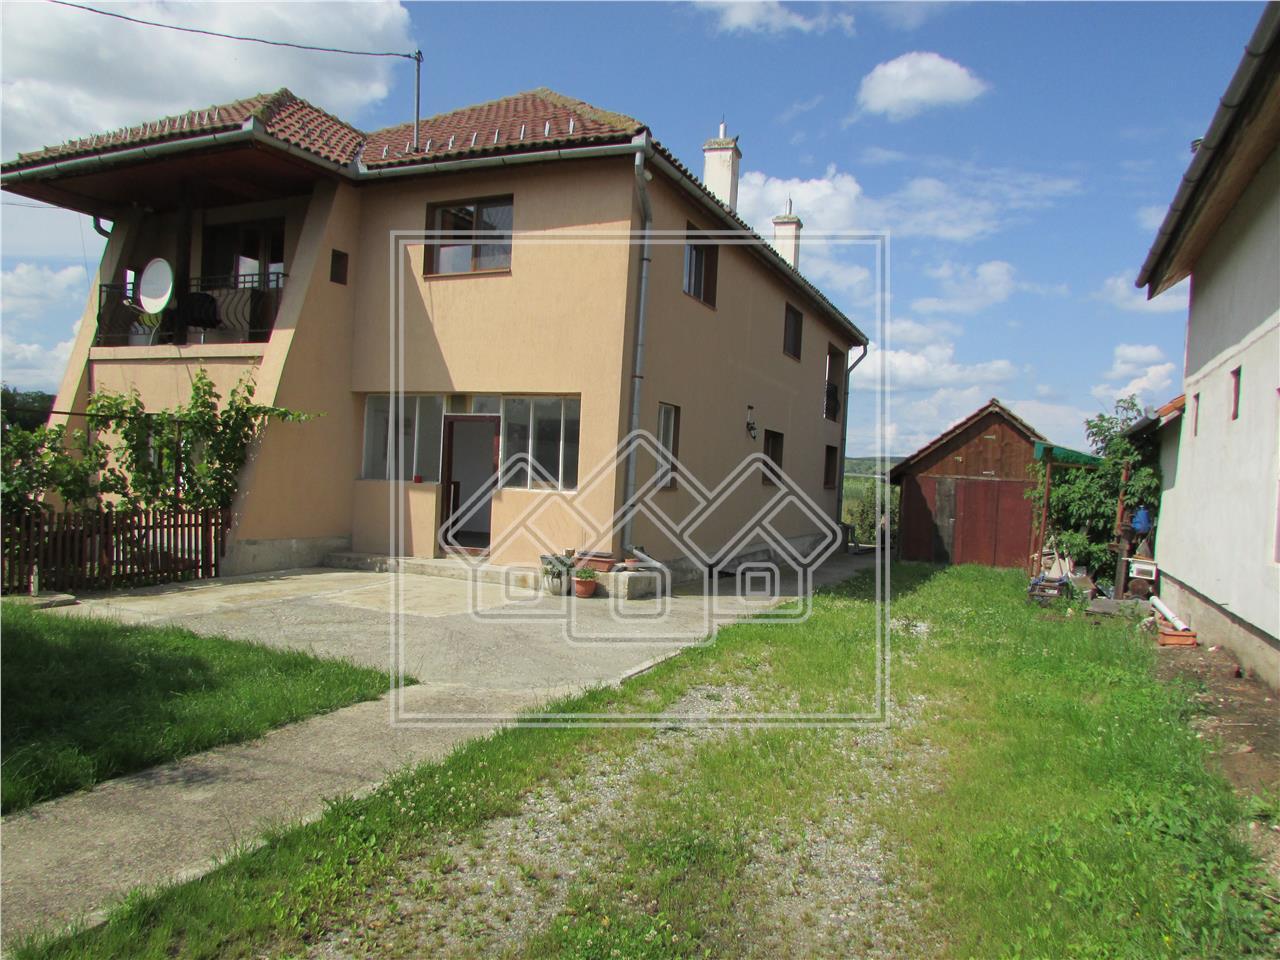 Casa de Inchiriat in Sibiu- Mobilata si utilata- Zona Comerciala